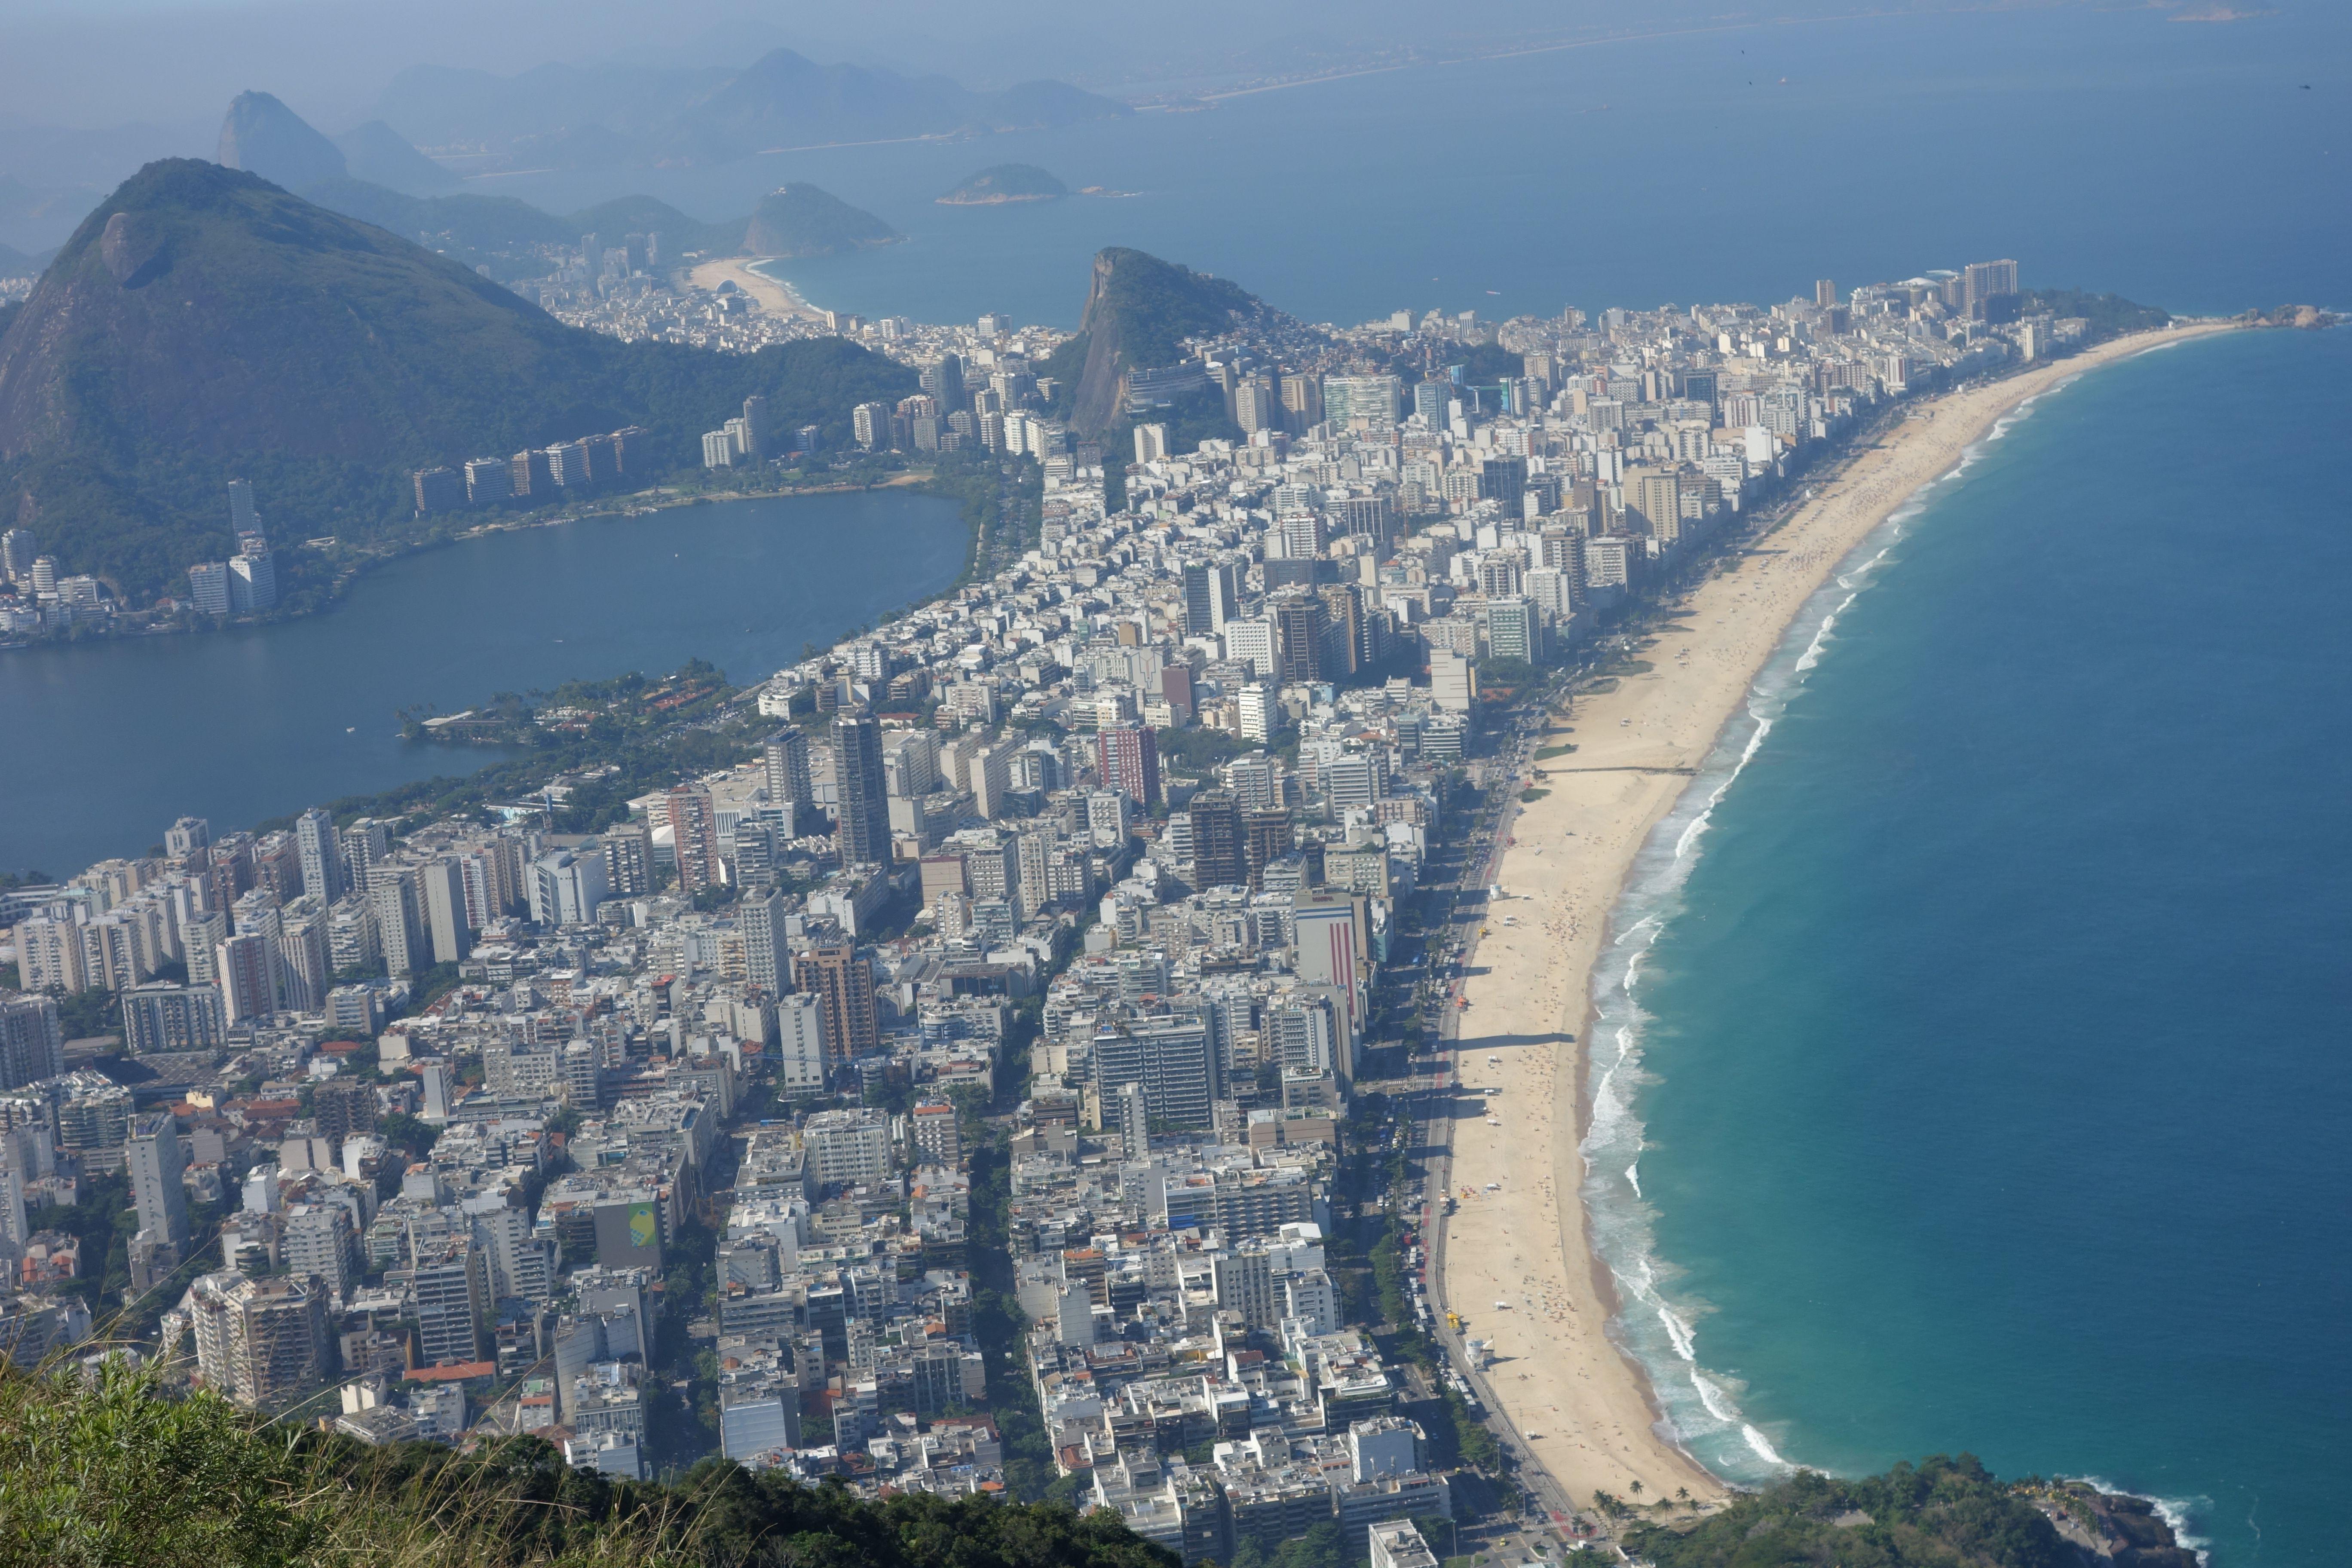 Rio de Janeiro au Brésil photo blog voyage tour du monde travel https://yoytourdumonde.fr